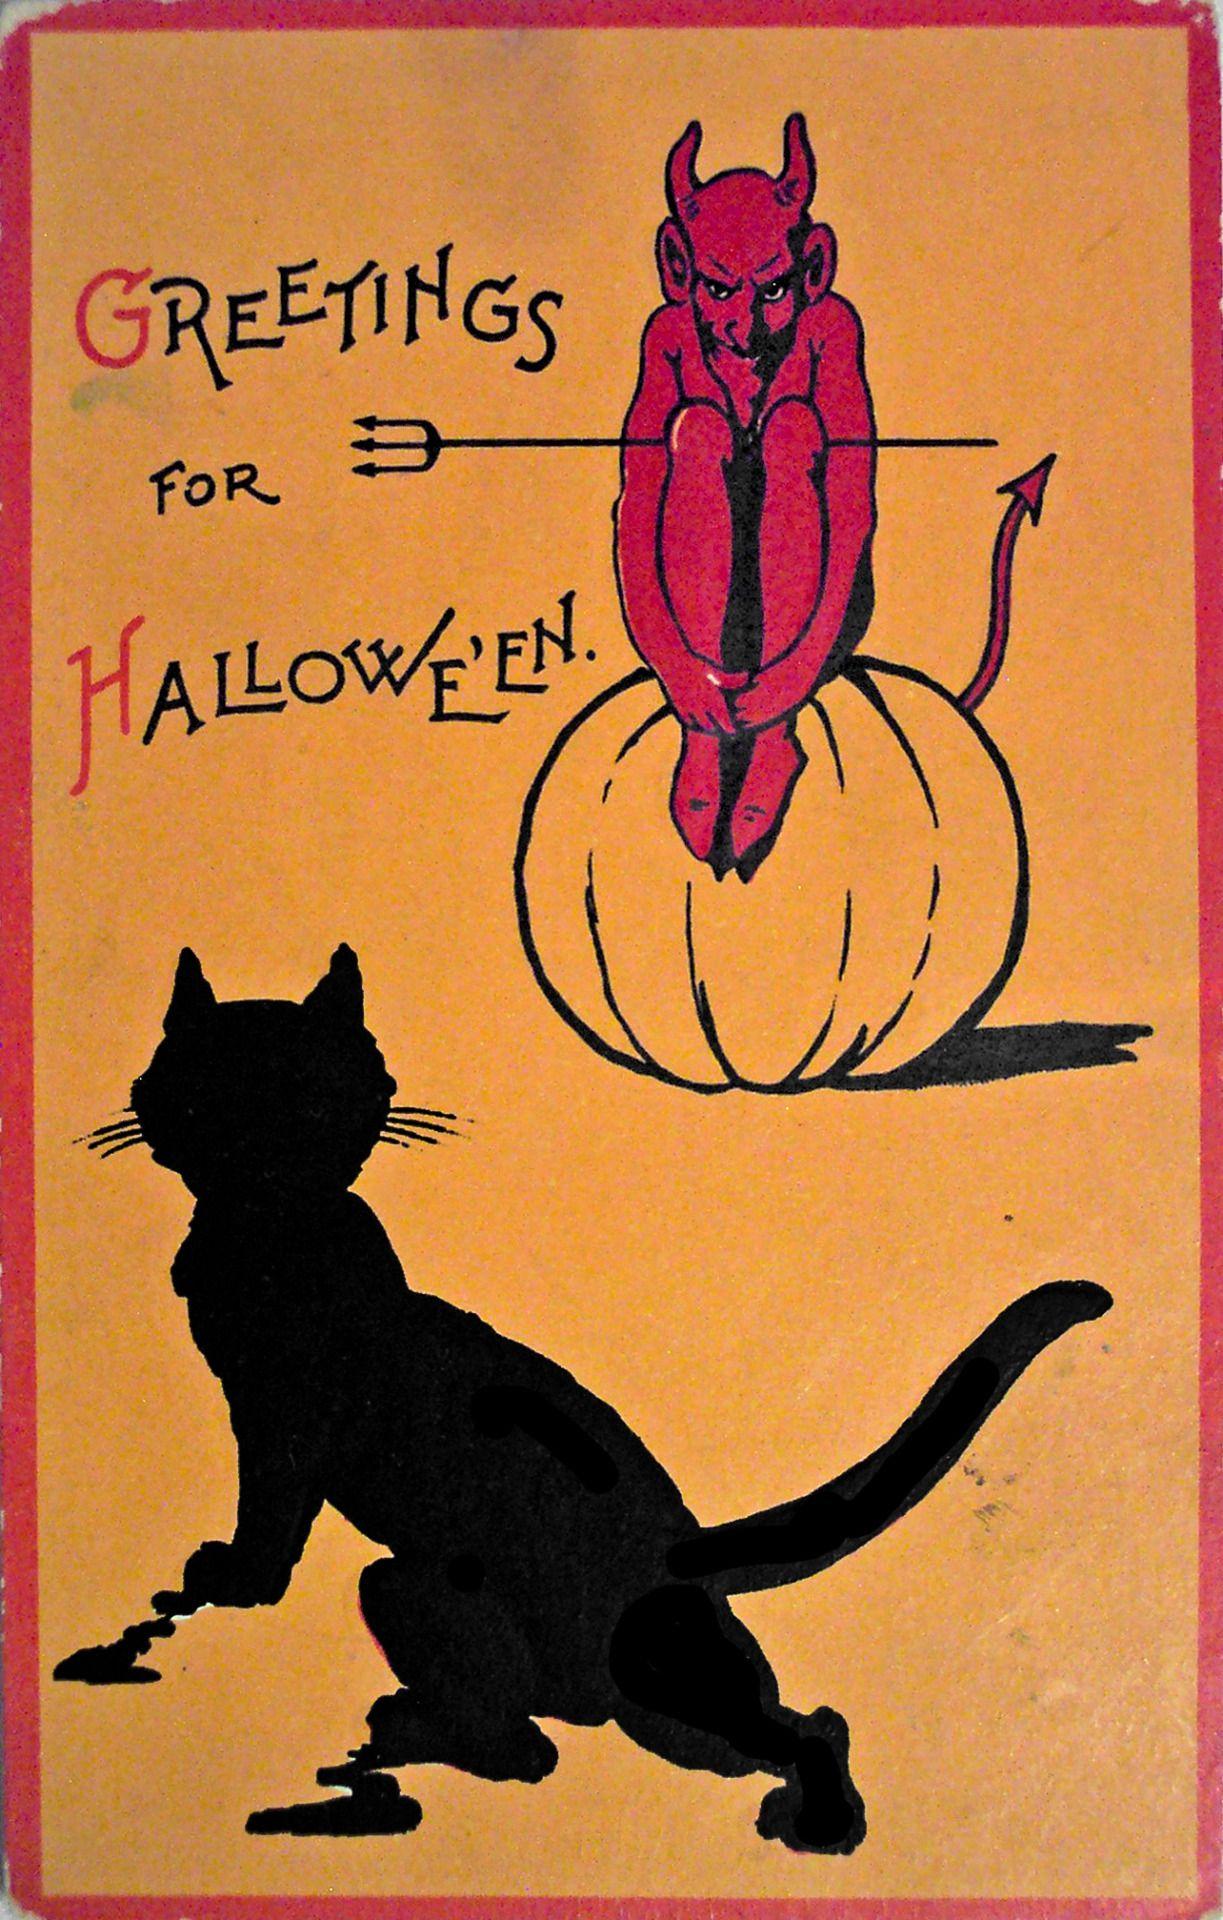 Danskjavlarna Greetings For Halloween Date Unknown